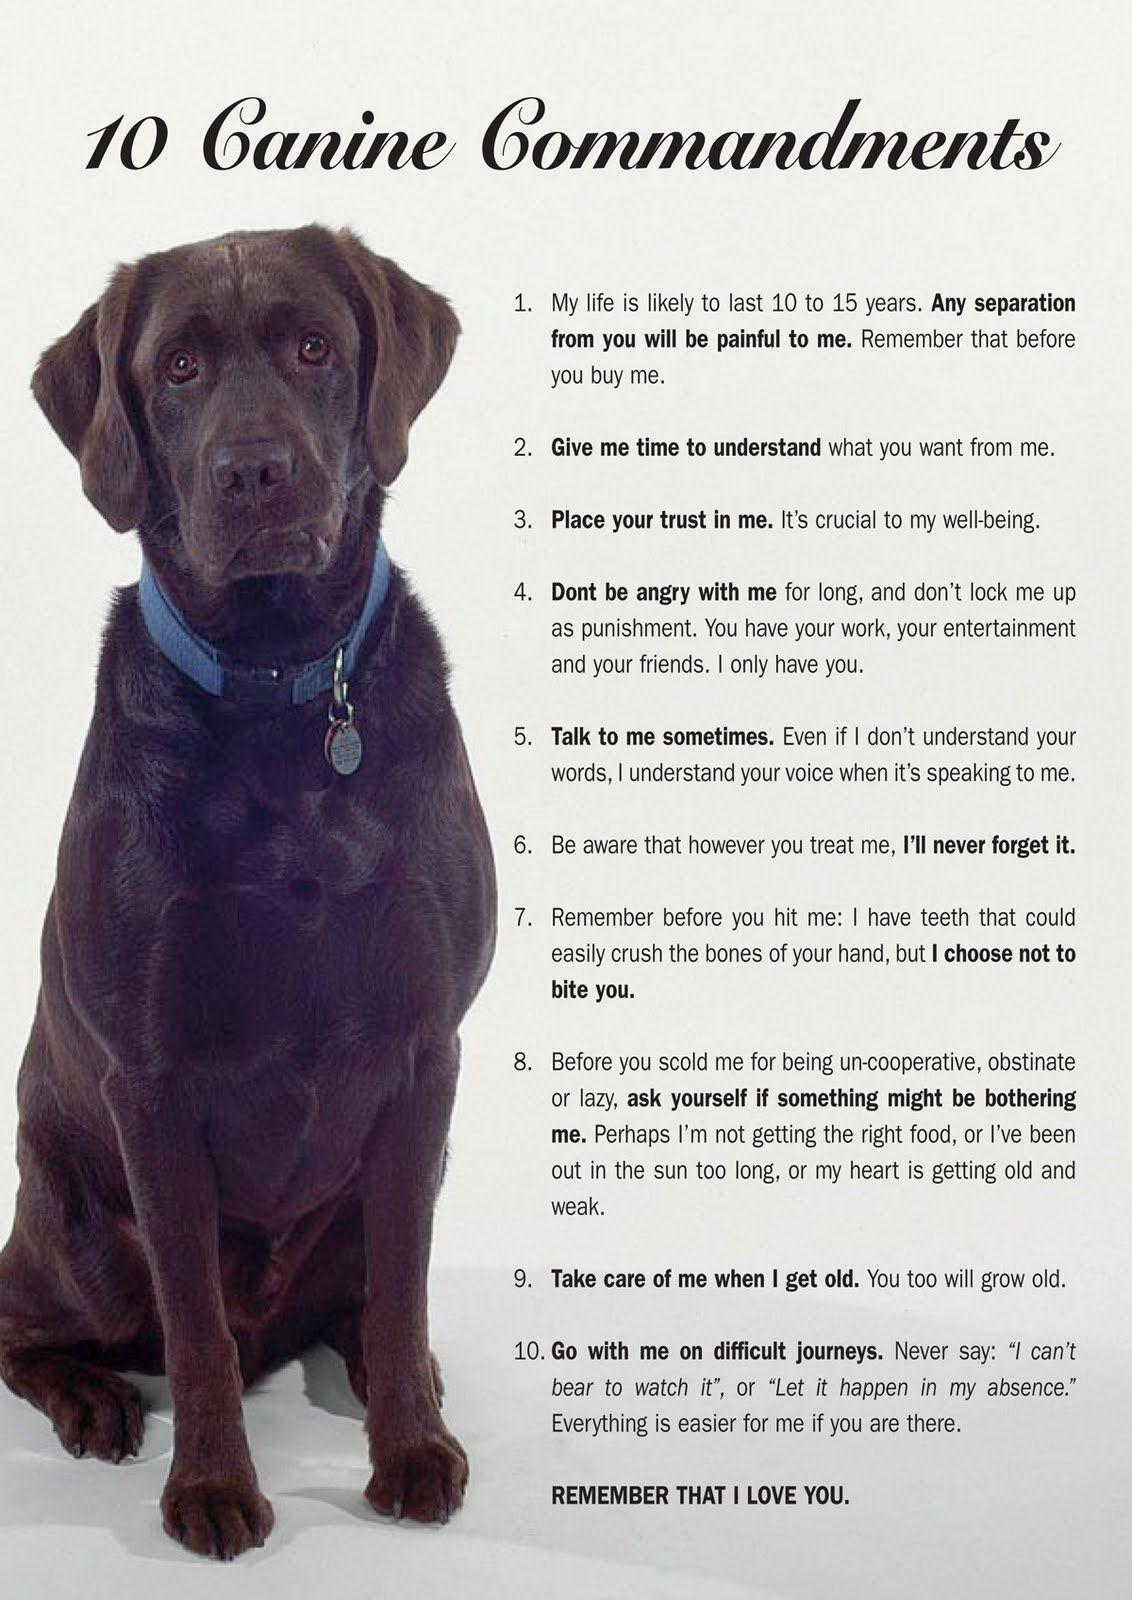 How Do You Put A Dog Down